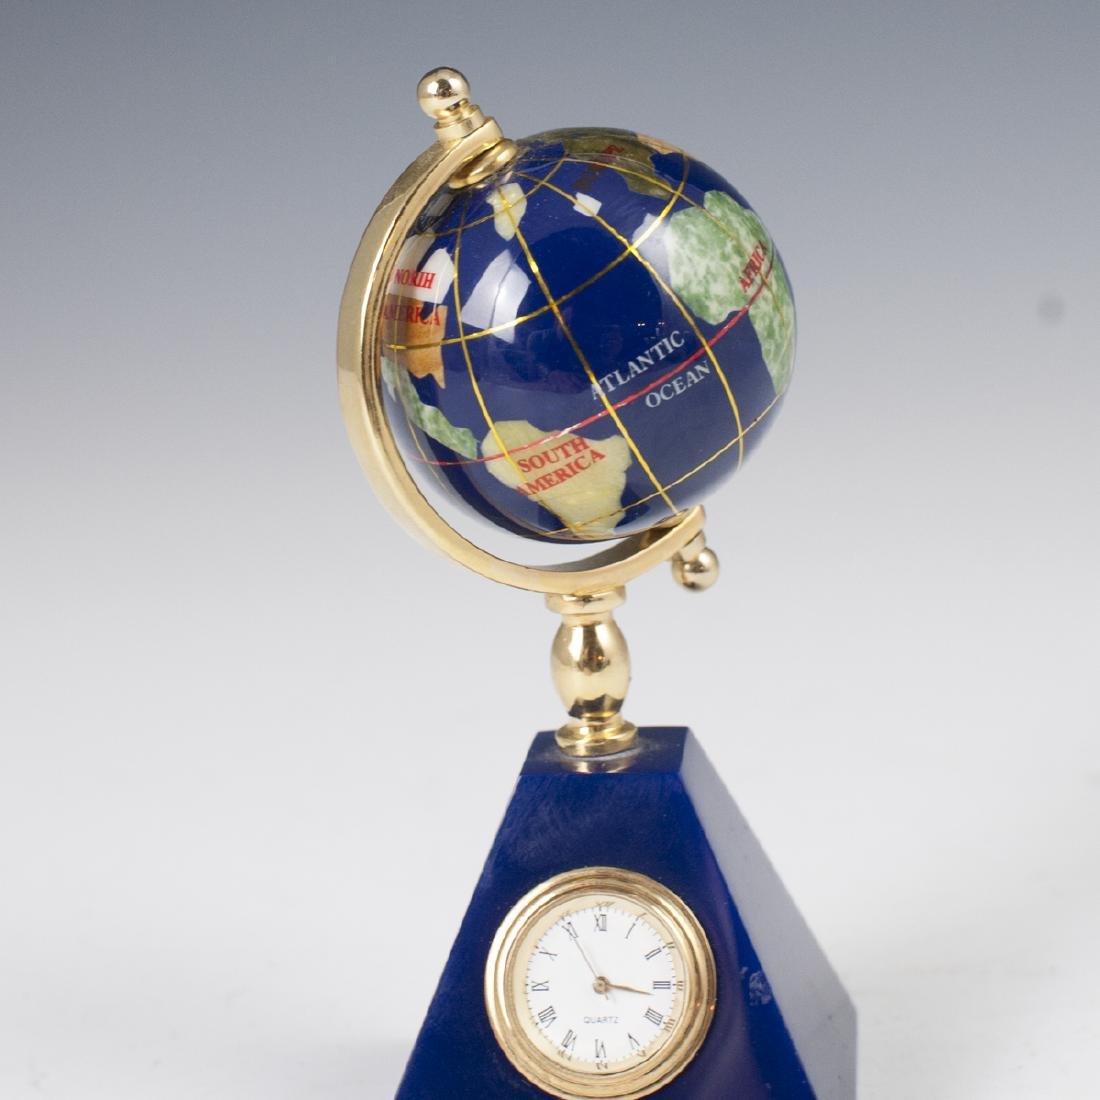 Vintage Semi-Precious Stone Globe Clock - 2